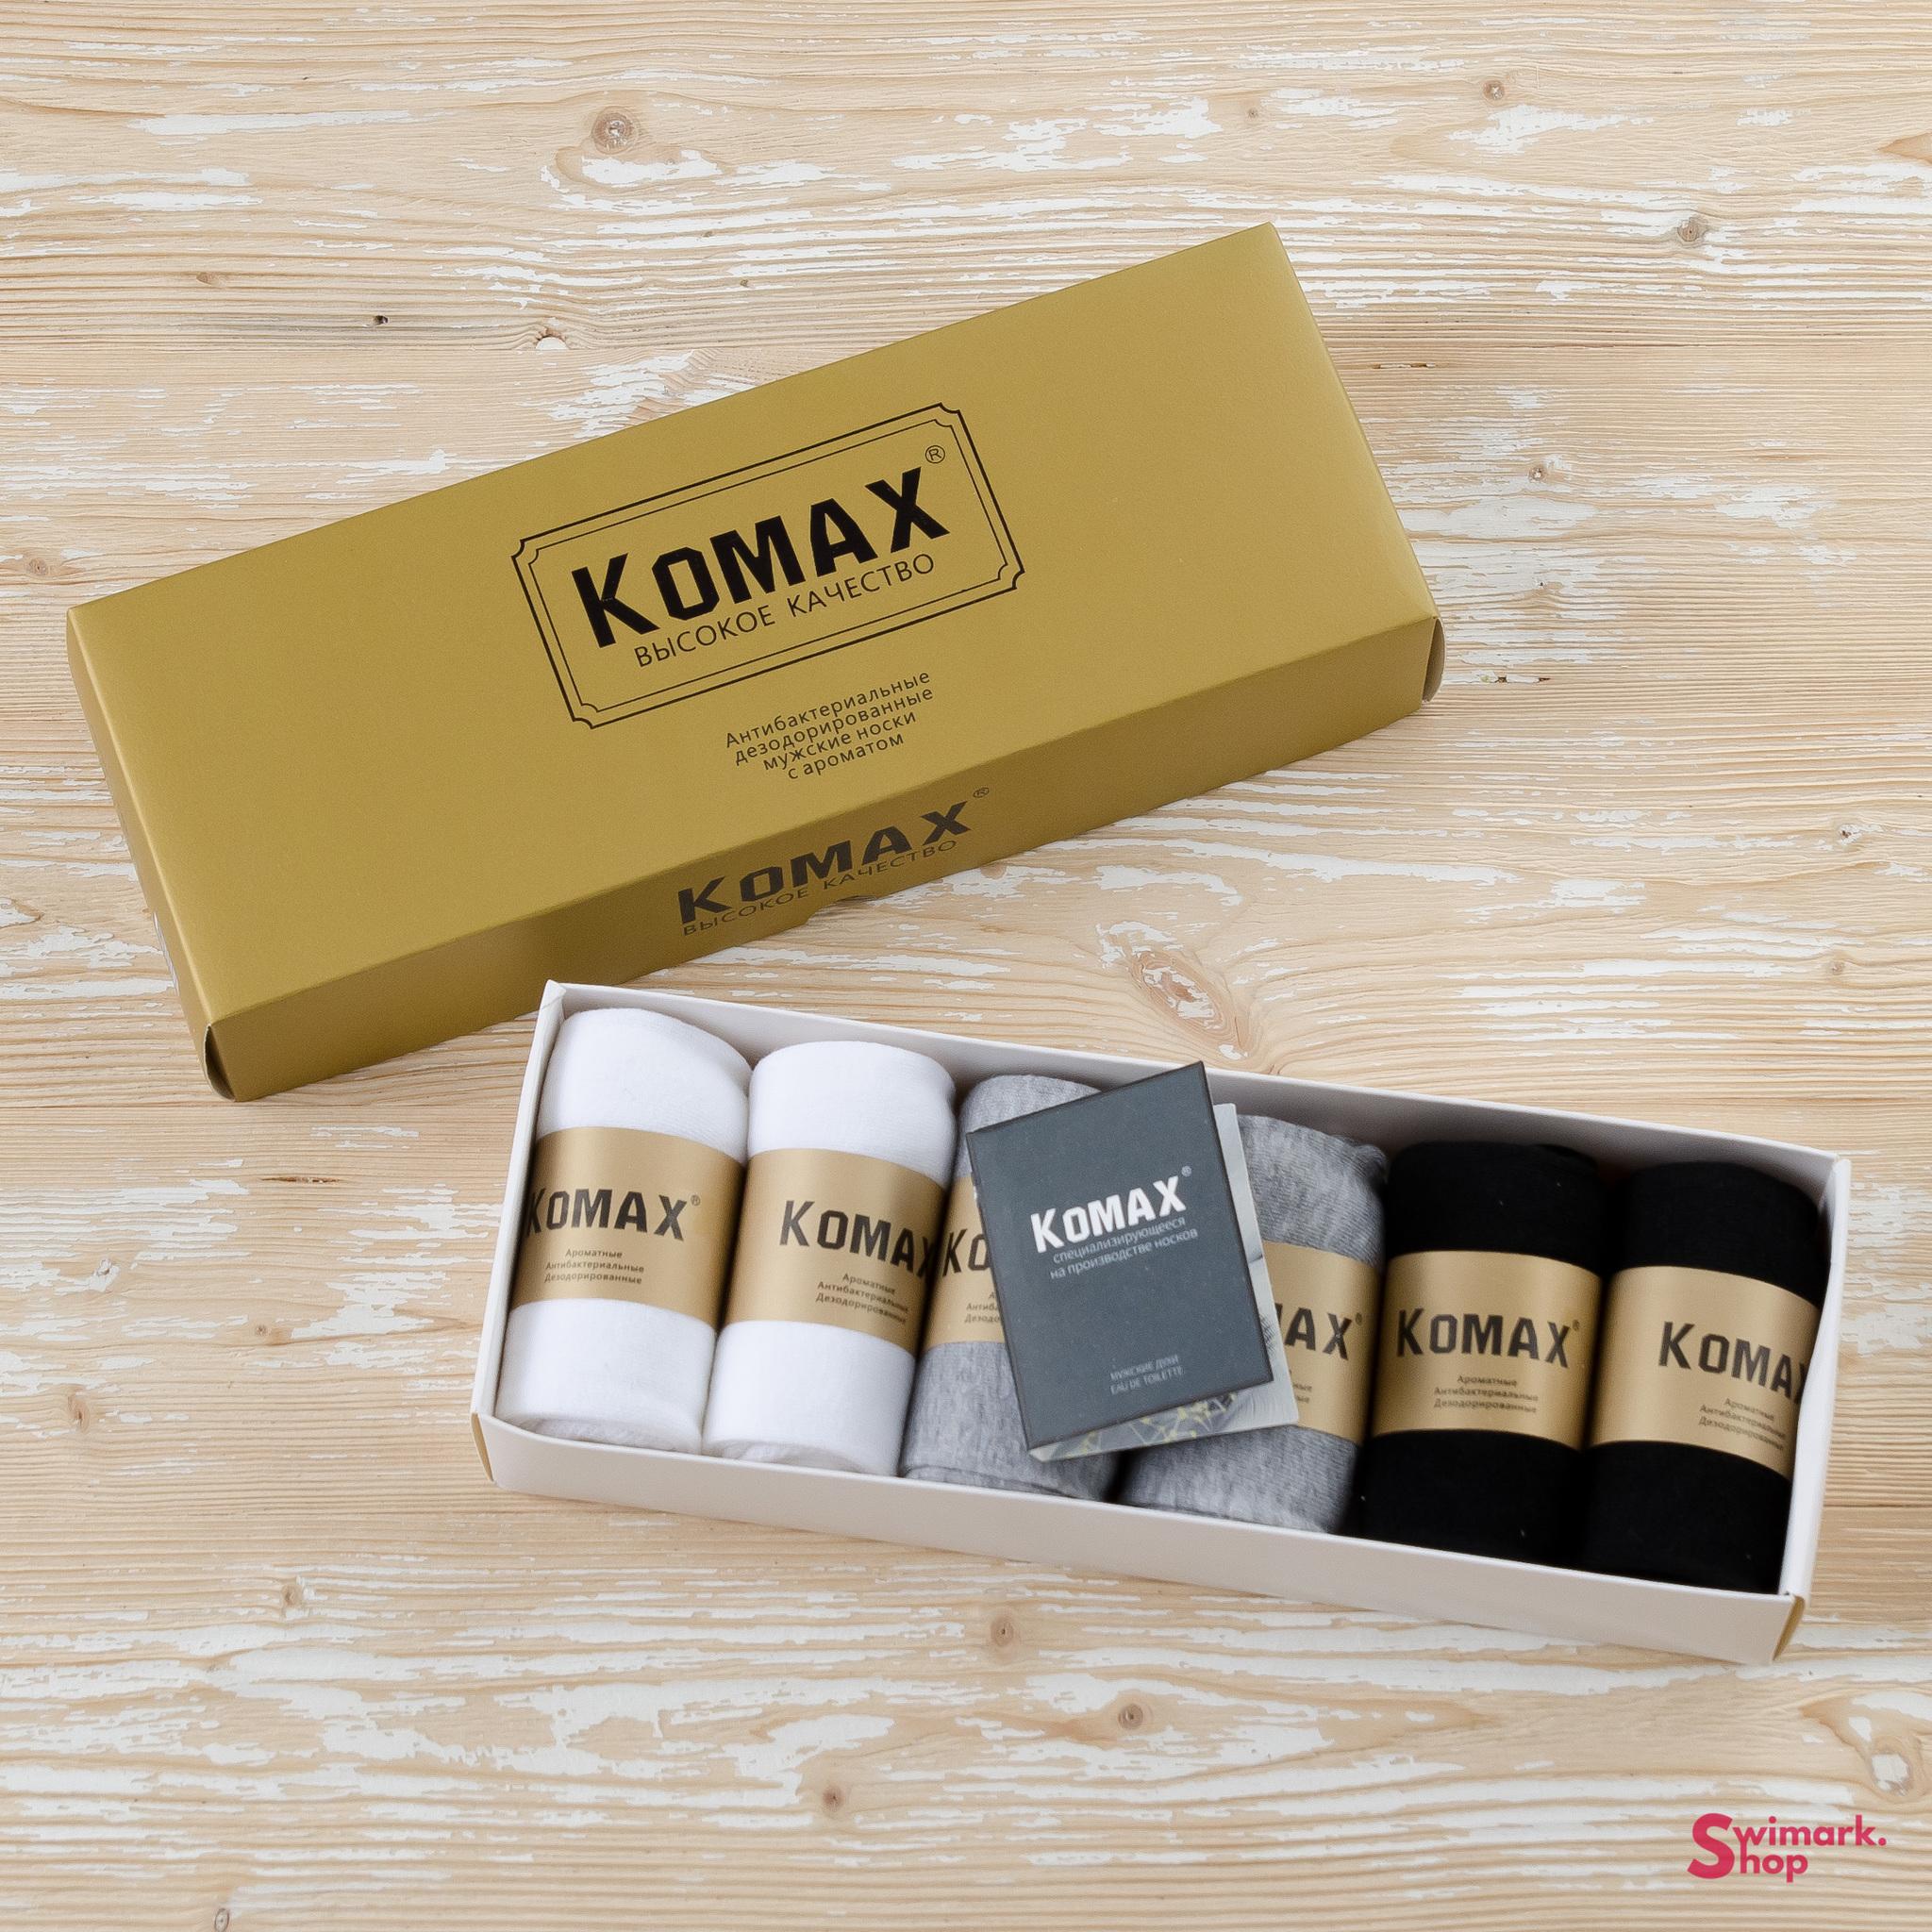 Носки мужские KOMAX ARR-31, 6 шт. в уп.